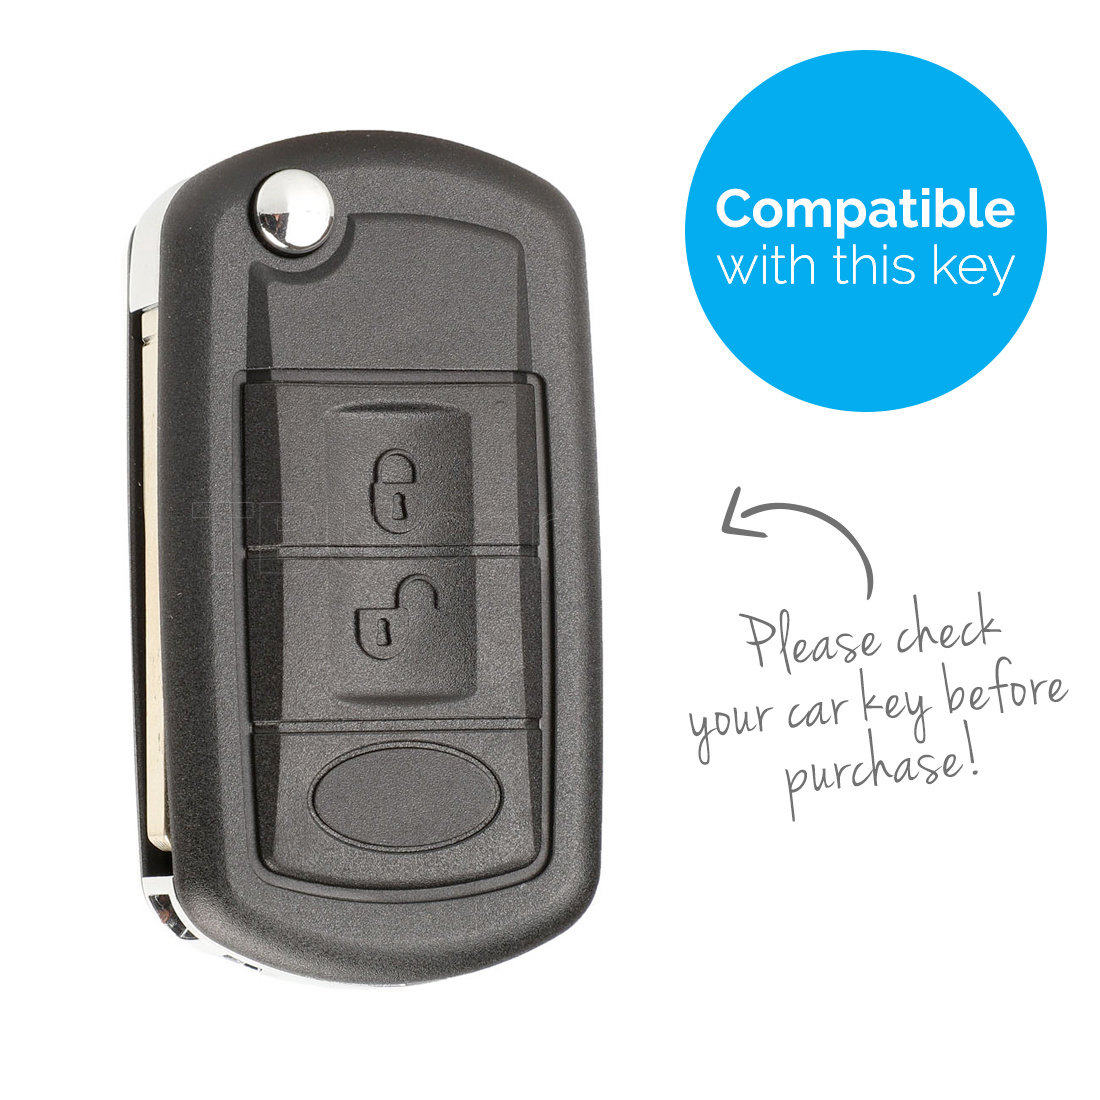 TBU car TBU car Sleutel cover compatibel met Land Rover - Silicone sleutelhoesje - beschermhoesje autosleutel - Lichtblauw